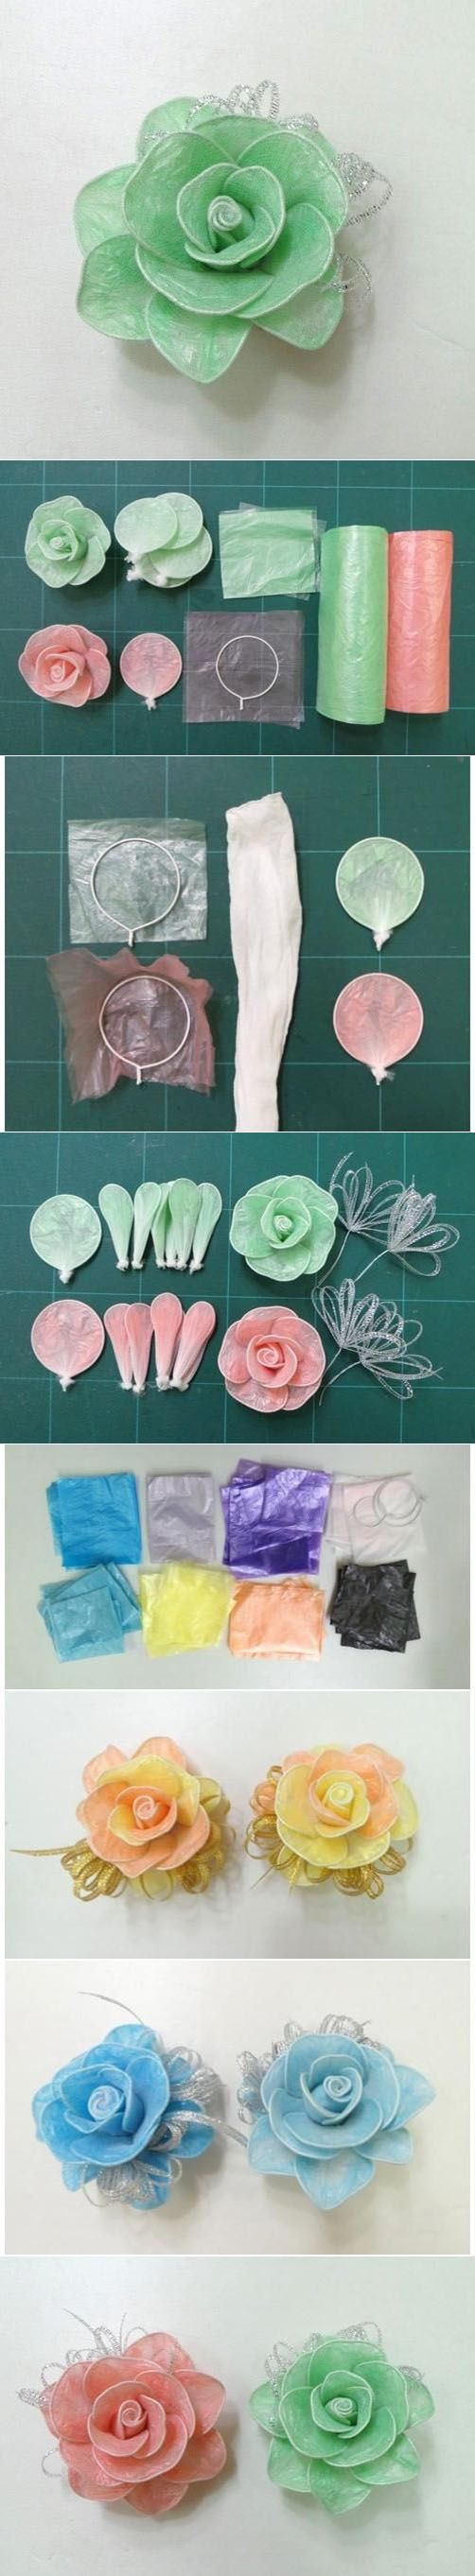 Diy Beautiful Flowers   DIY & Crafts Tutorials